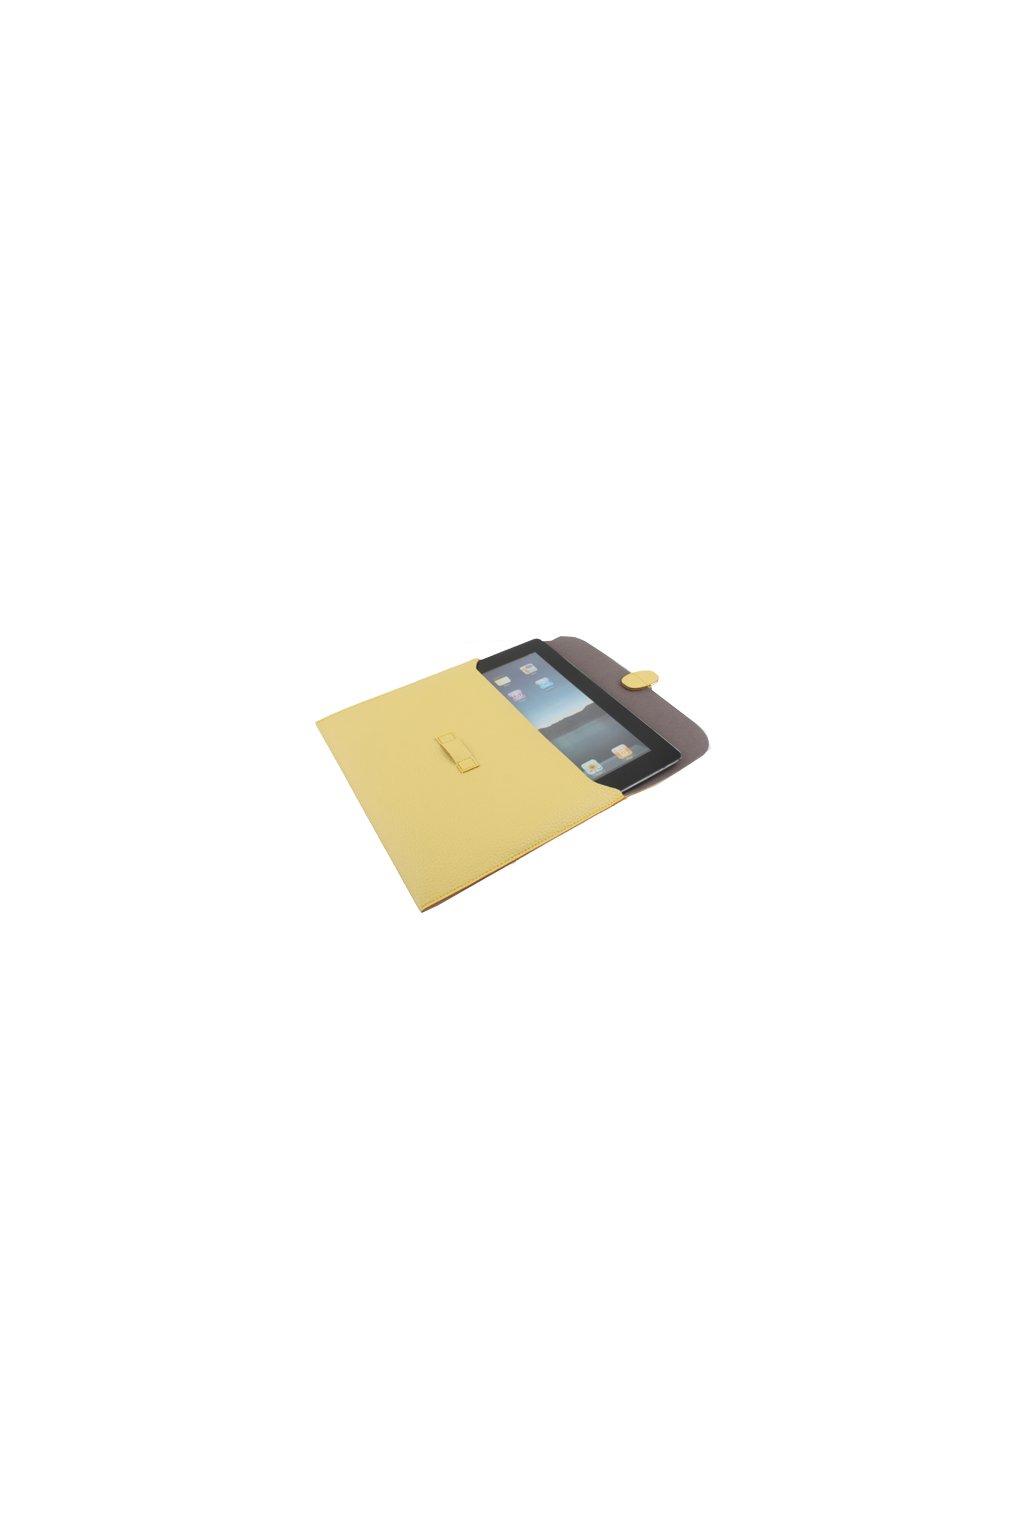 Pouzdro Omo iPad 2/3/4/Air, yellow/žlutá